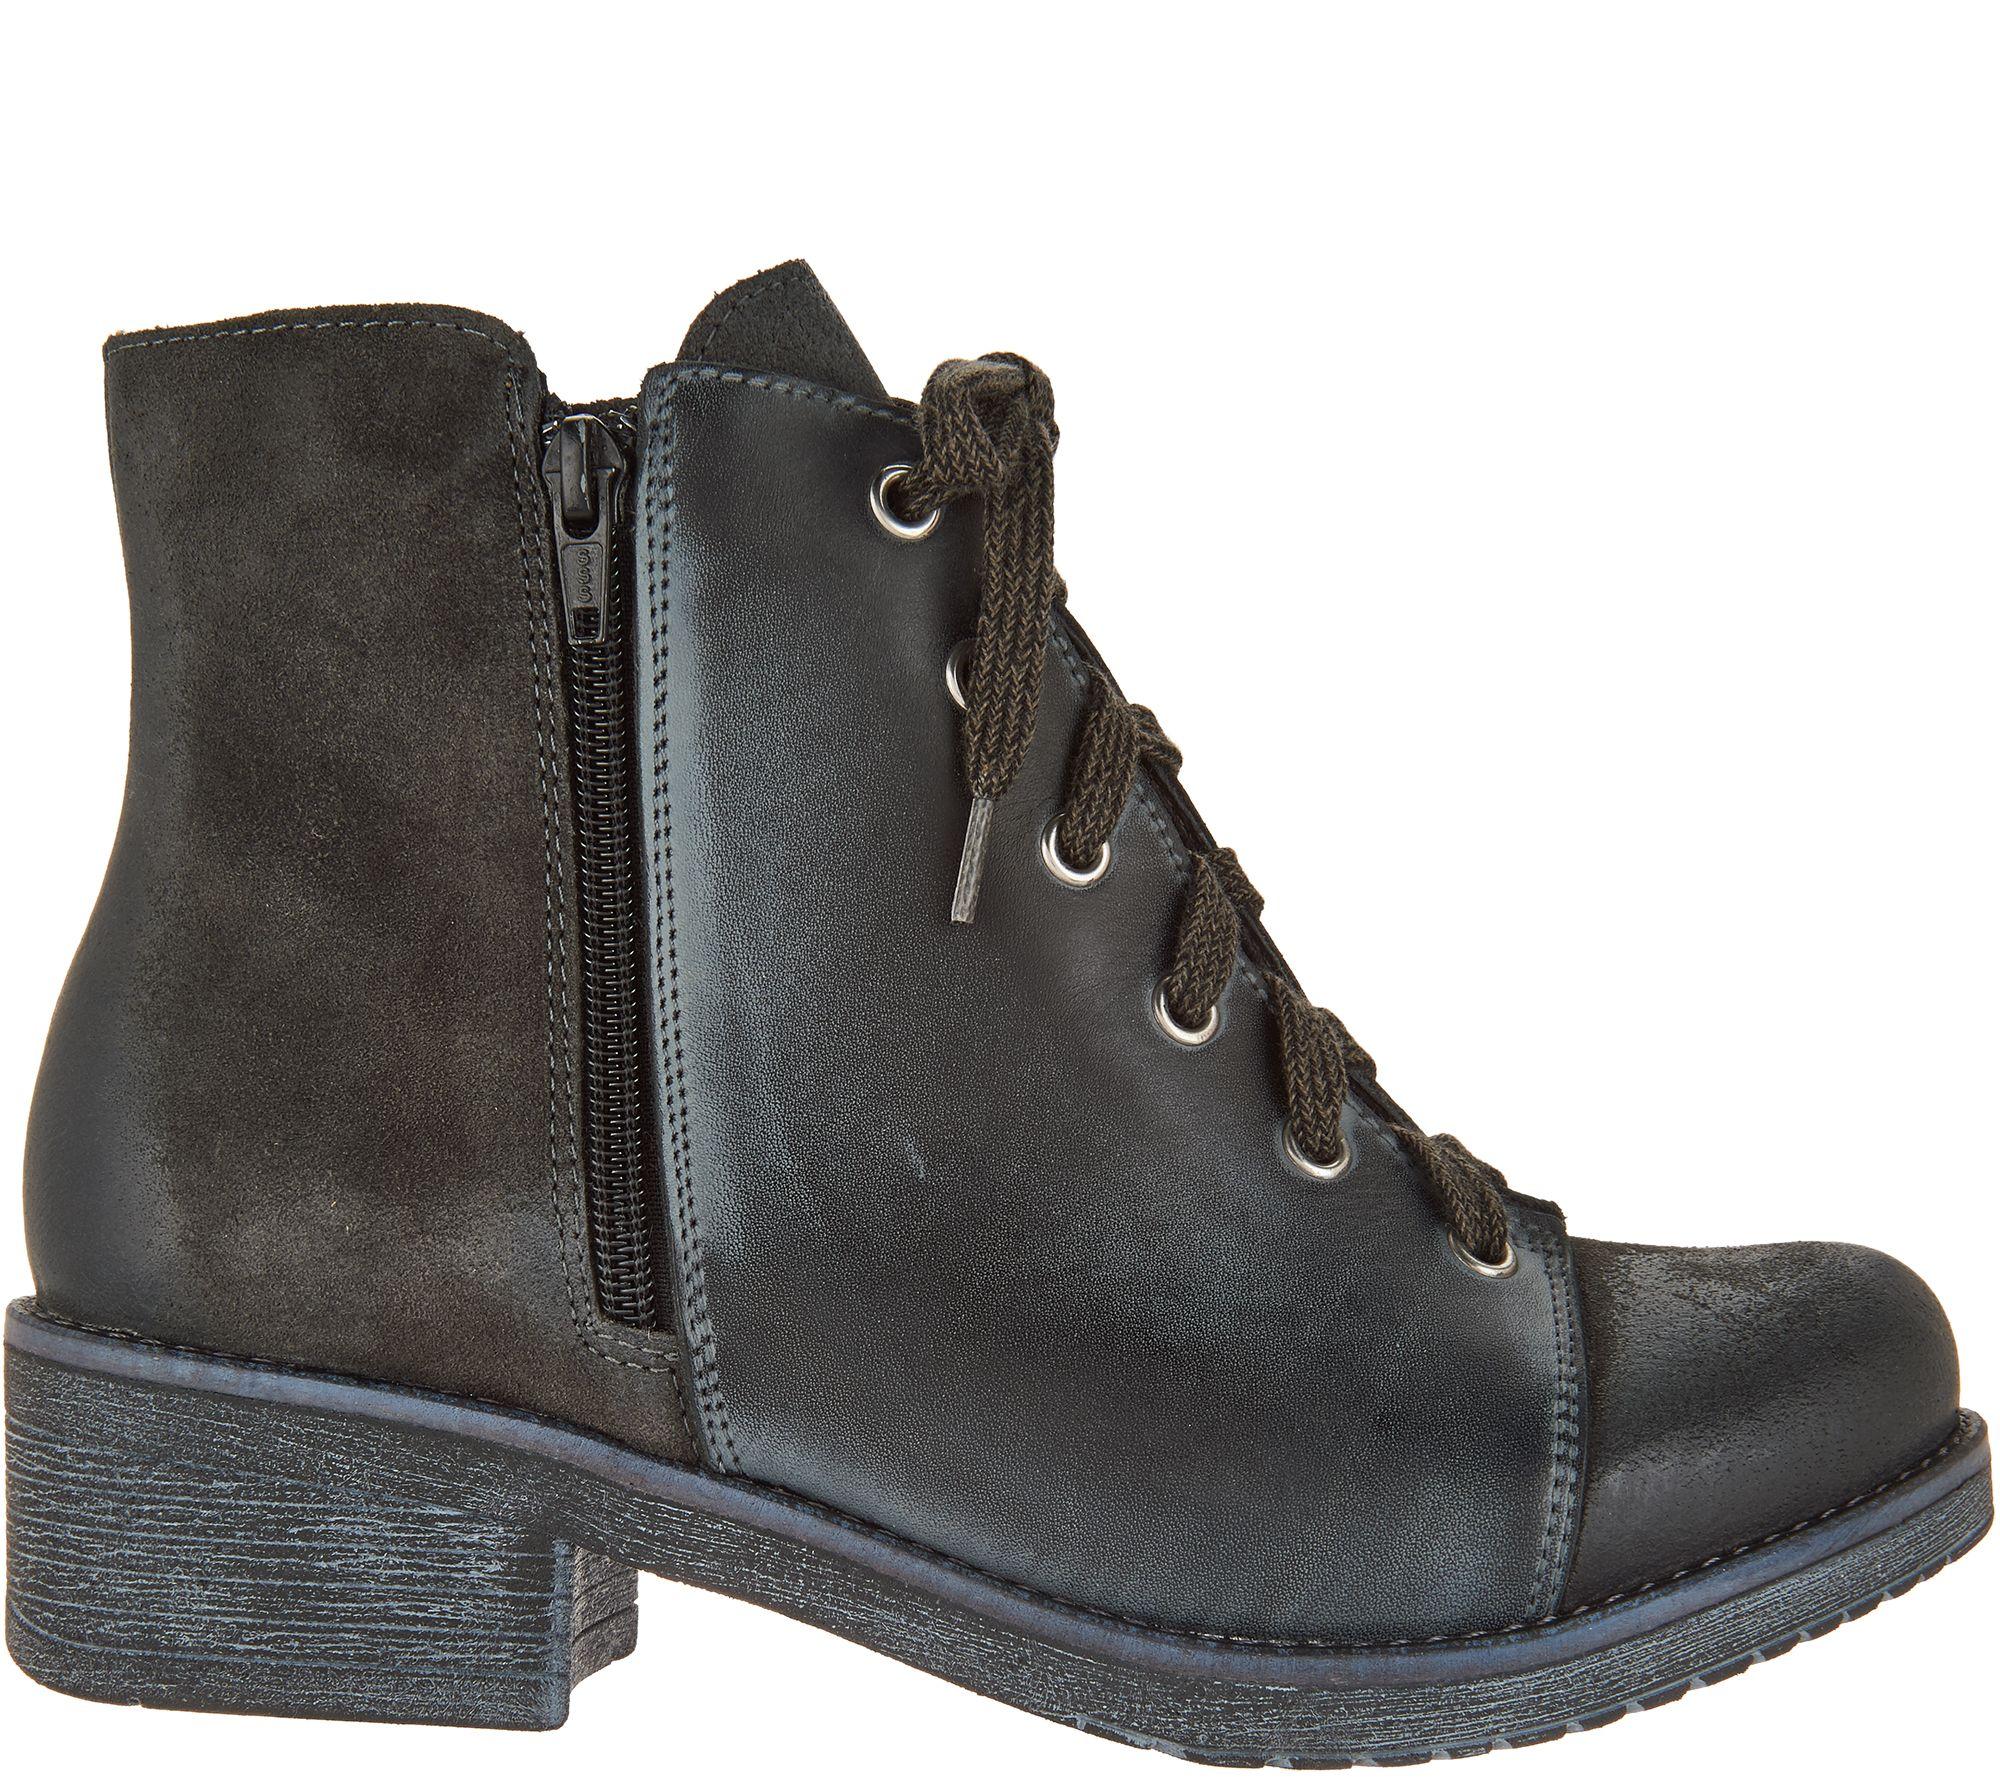 Naot Womens Levanto Desert Suede Boots 39 EU mLjCijJvio